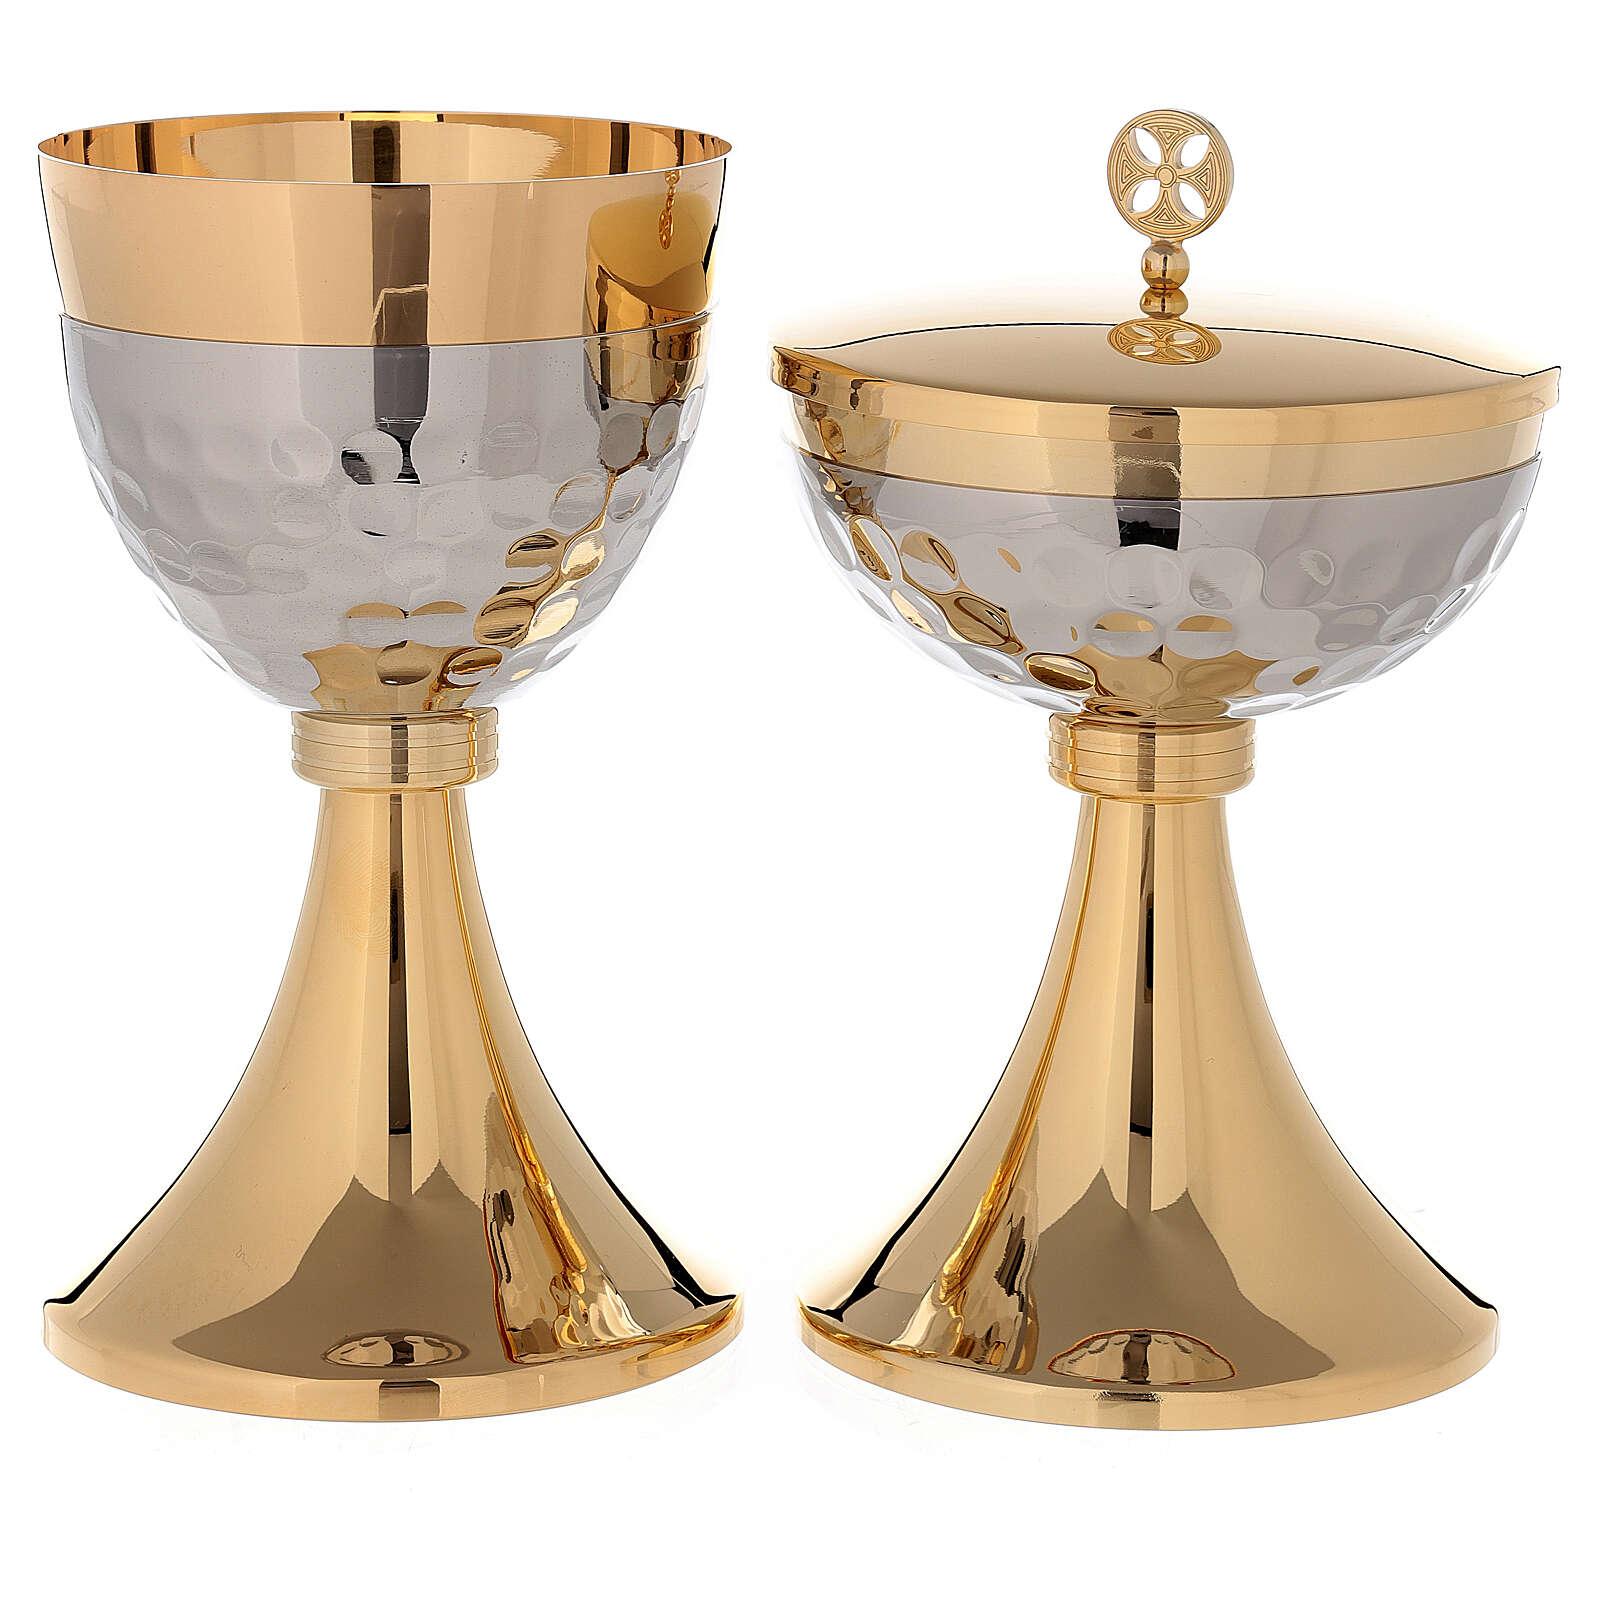 Cáliz Copón latón dorado 24k base de la copa martillada nudo simple 4